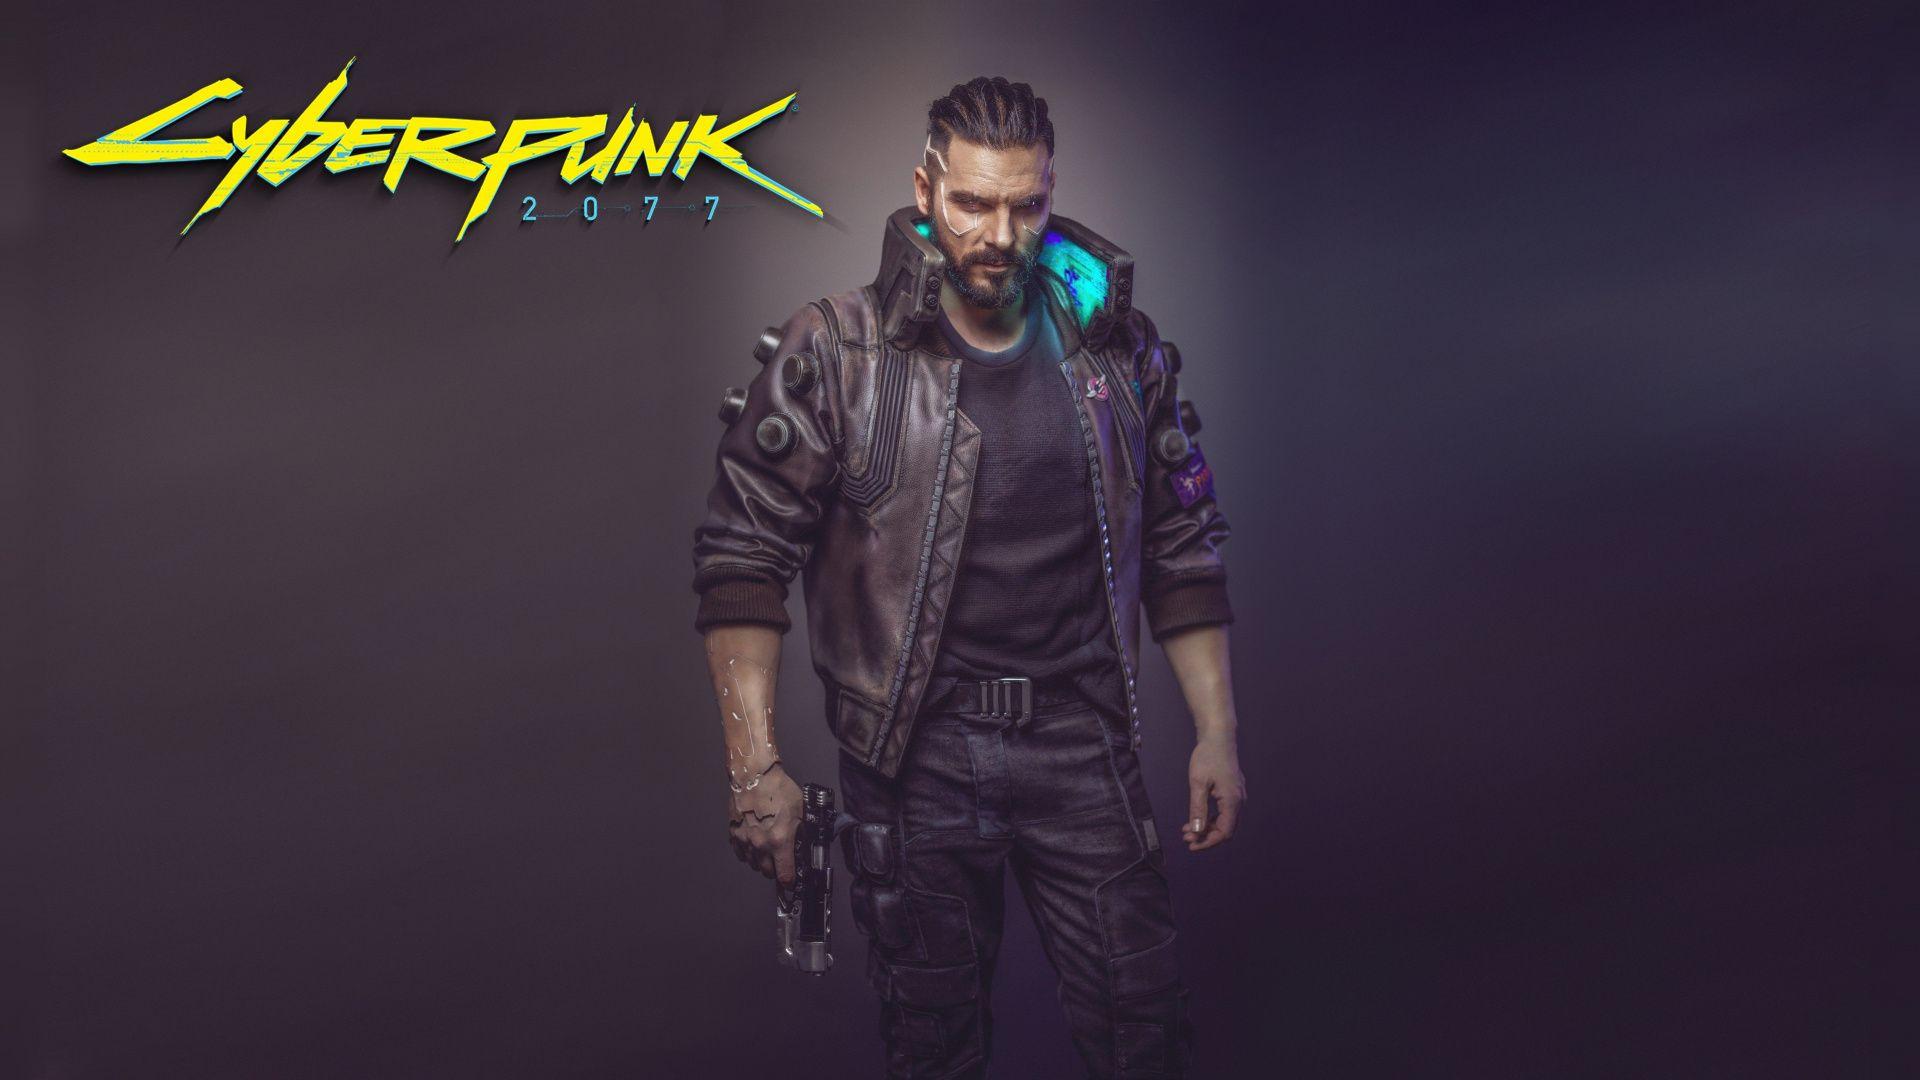 1920x1080 Cyberpunk 2077 Need Trendy Iphone7 Iphone7plus Case Check Out Https Ift Tt 2itgto5 Cyberpunk 2077 Cyberpunk Cyberpunk 2077 Trailer